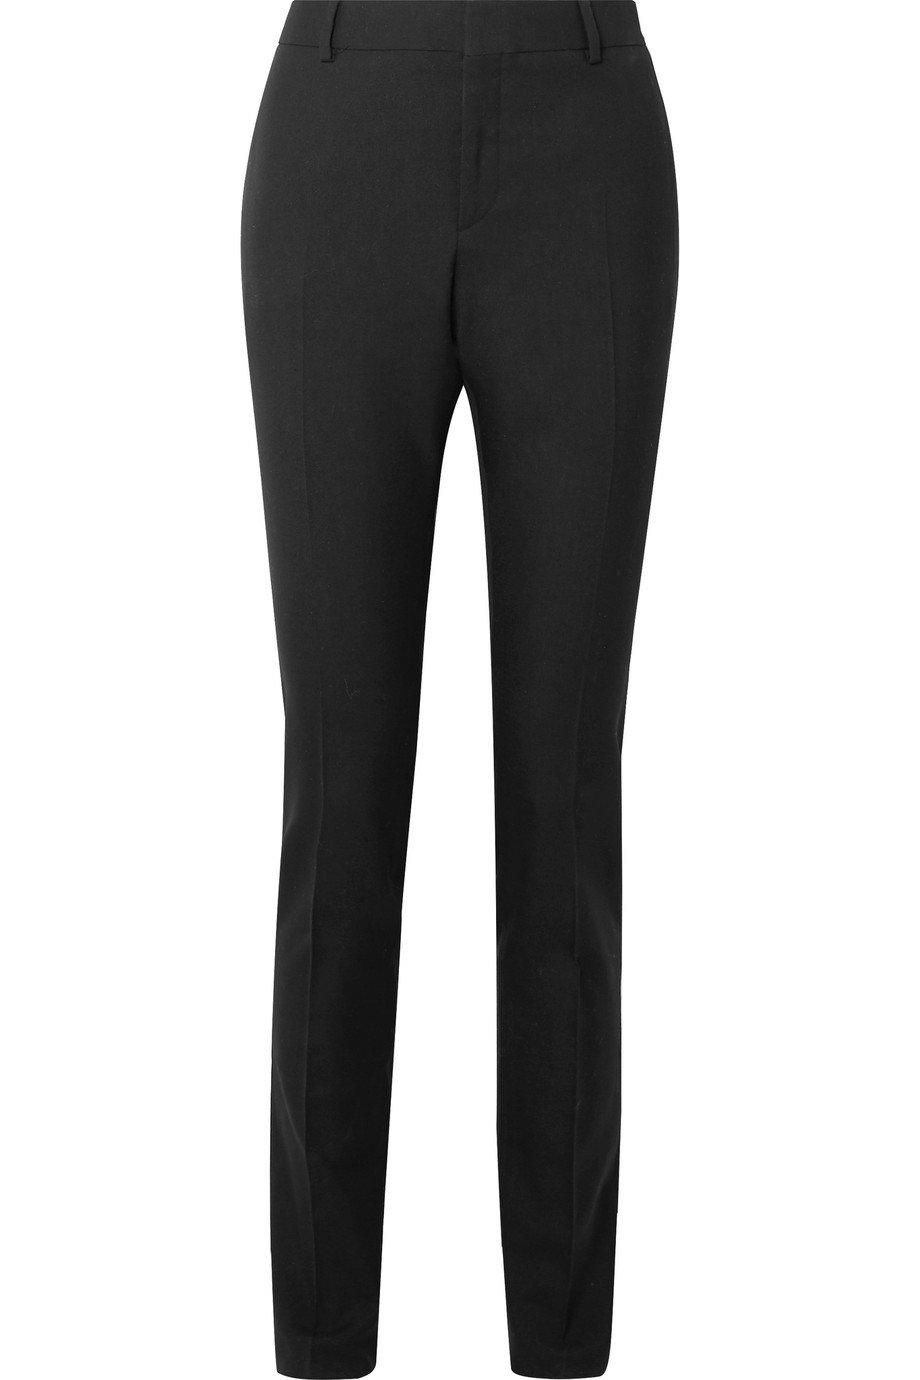 SAINT LAURENT | Wool-gabardine slim-leg pants | NET-A-PORTER.COM